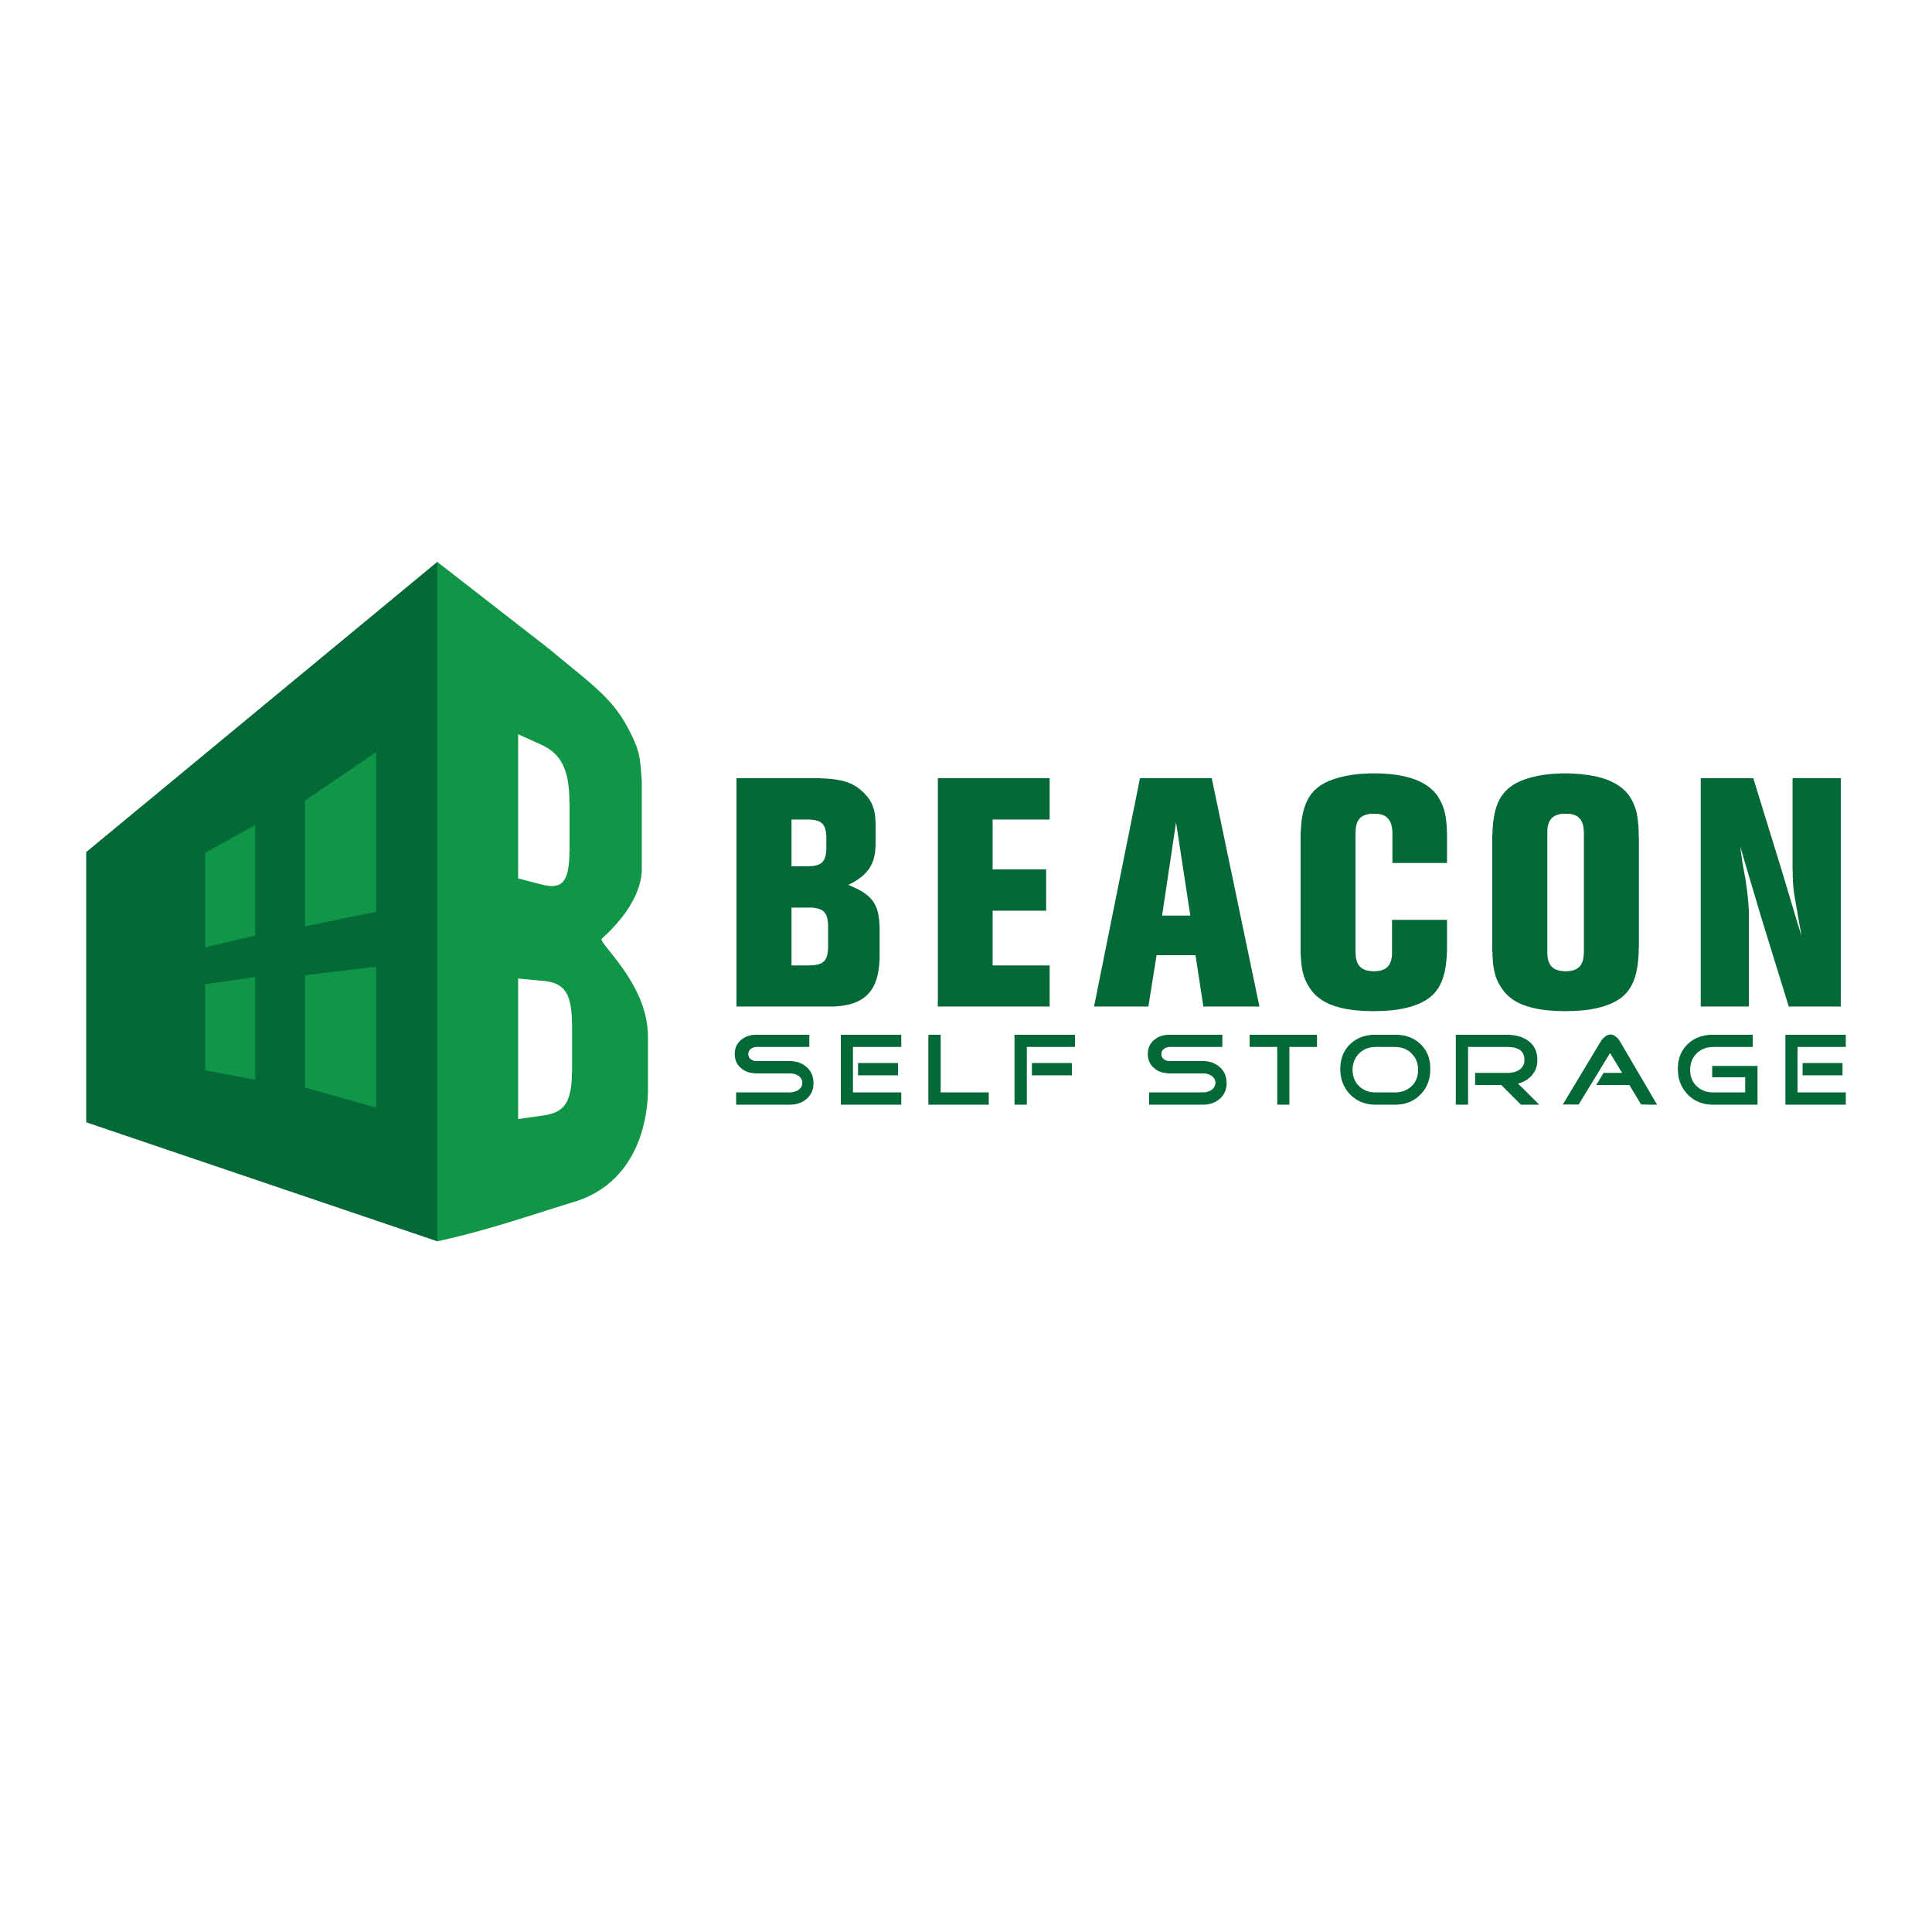 Beacon Self Storage.jpg